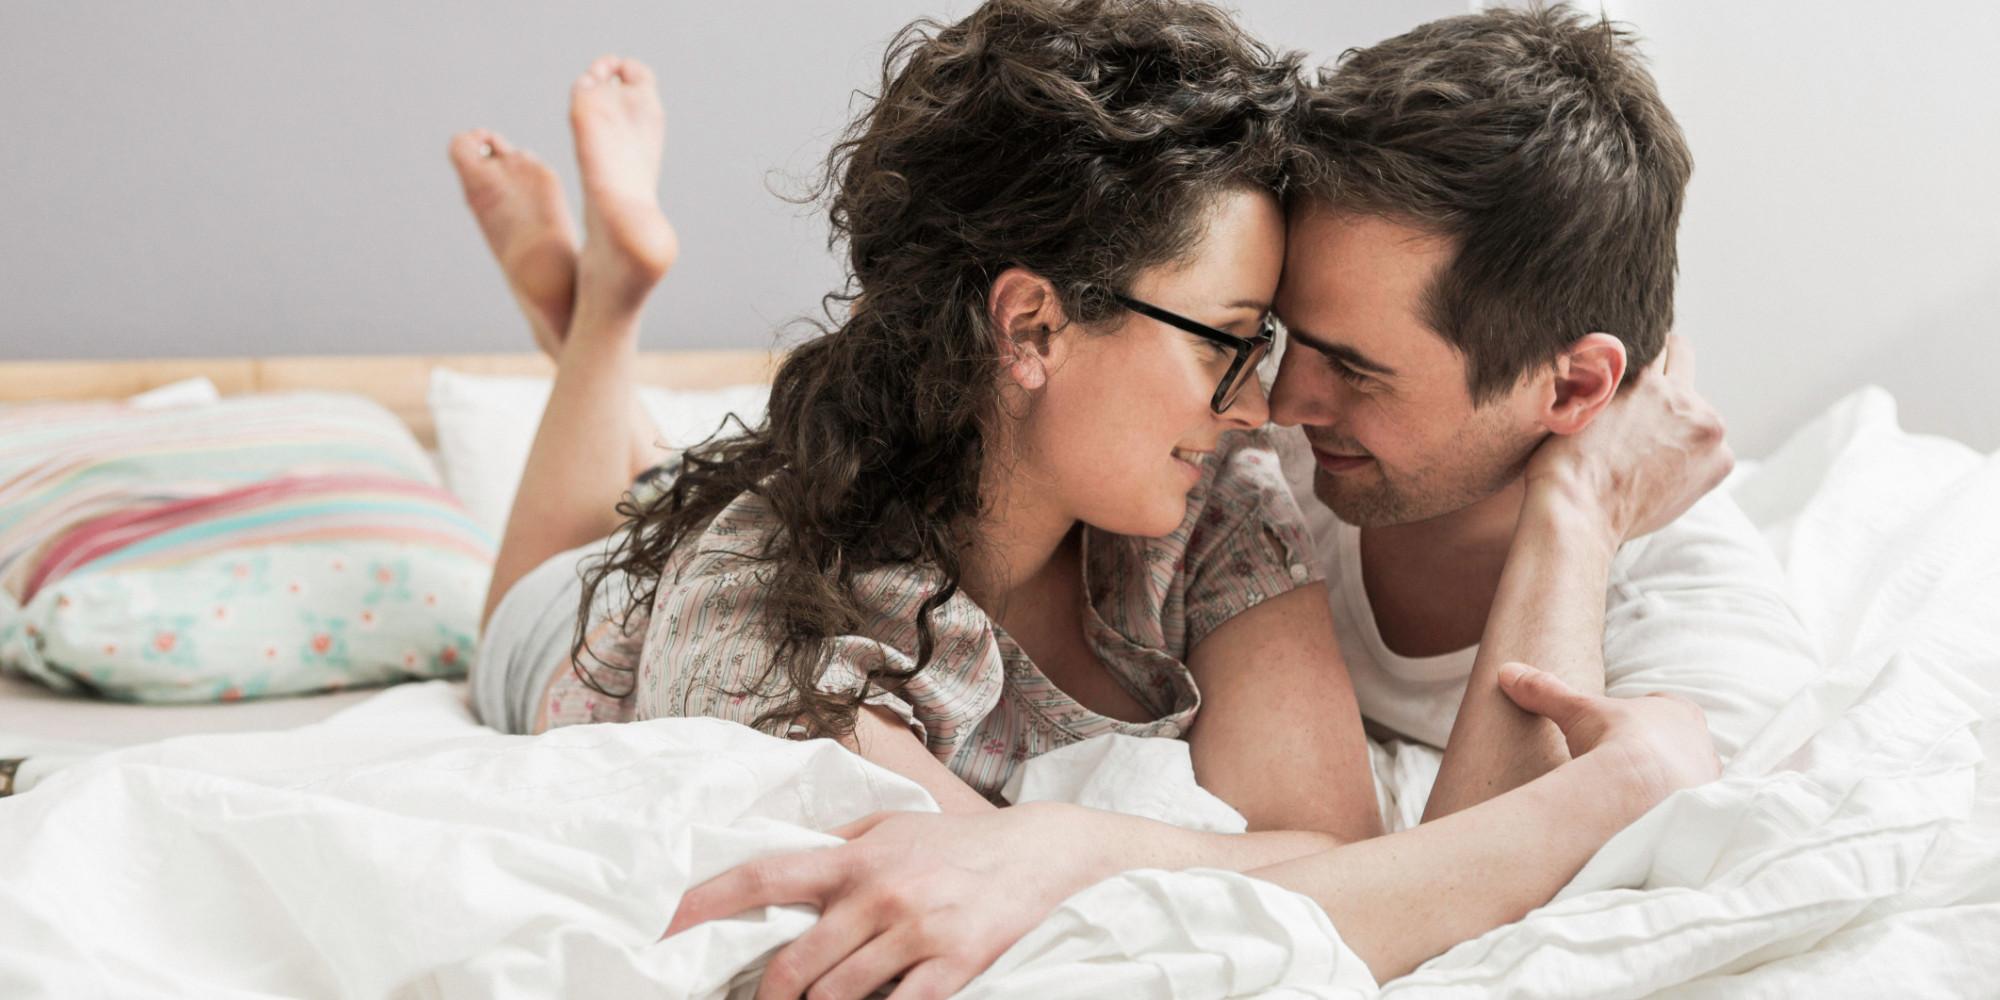 Show Me Women And Men Having Sex